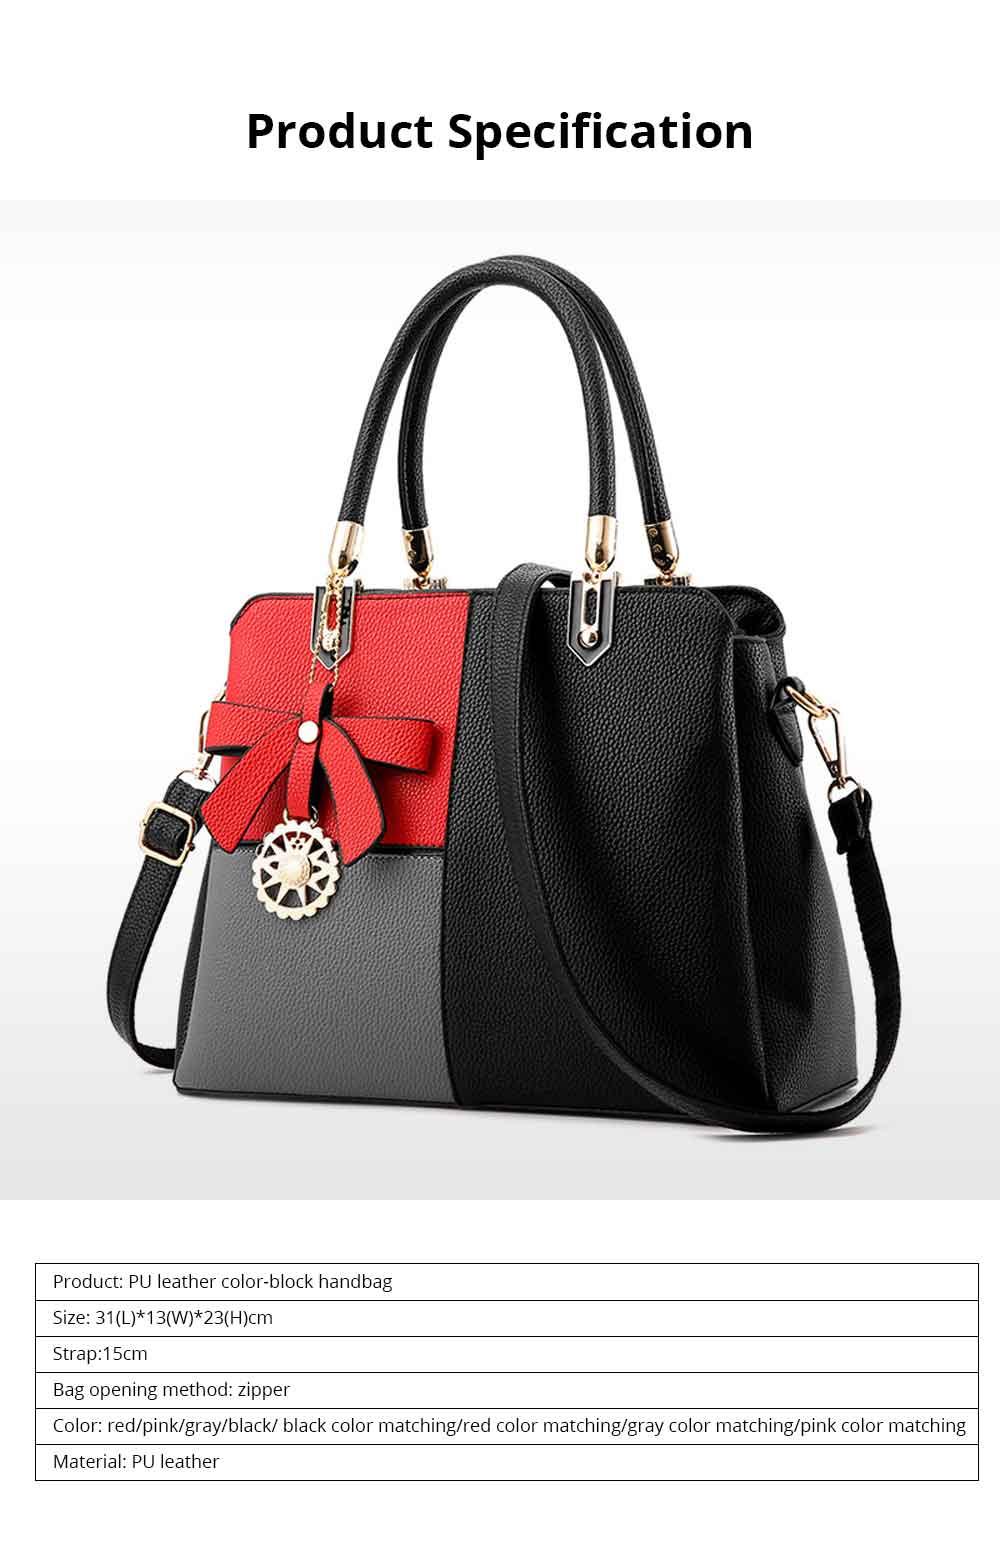 PU Leather Color-block Handbag for Ladies, Fashion Elegant Bag With Smooth Hardware Zipper, Large Capacity 6